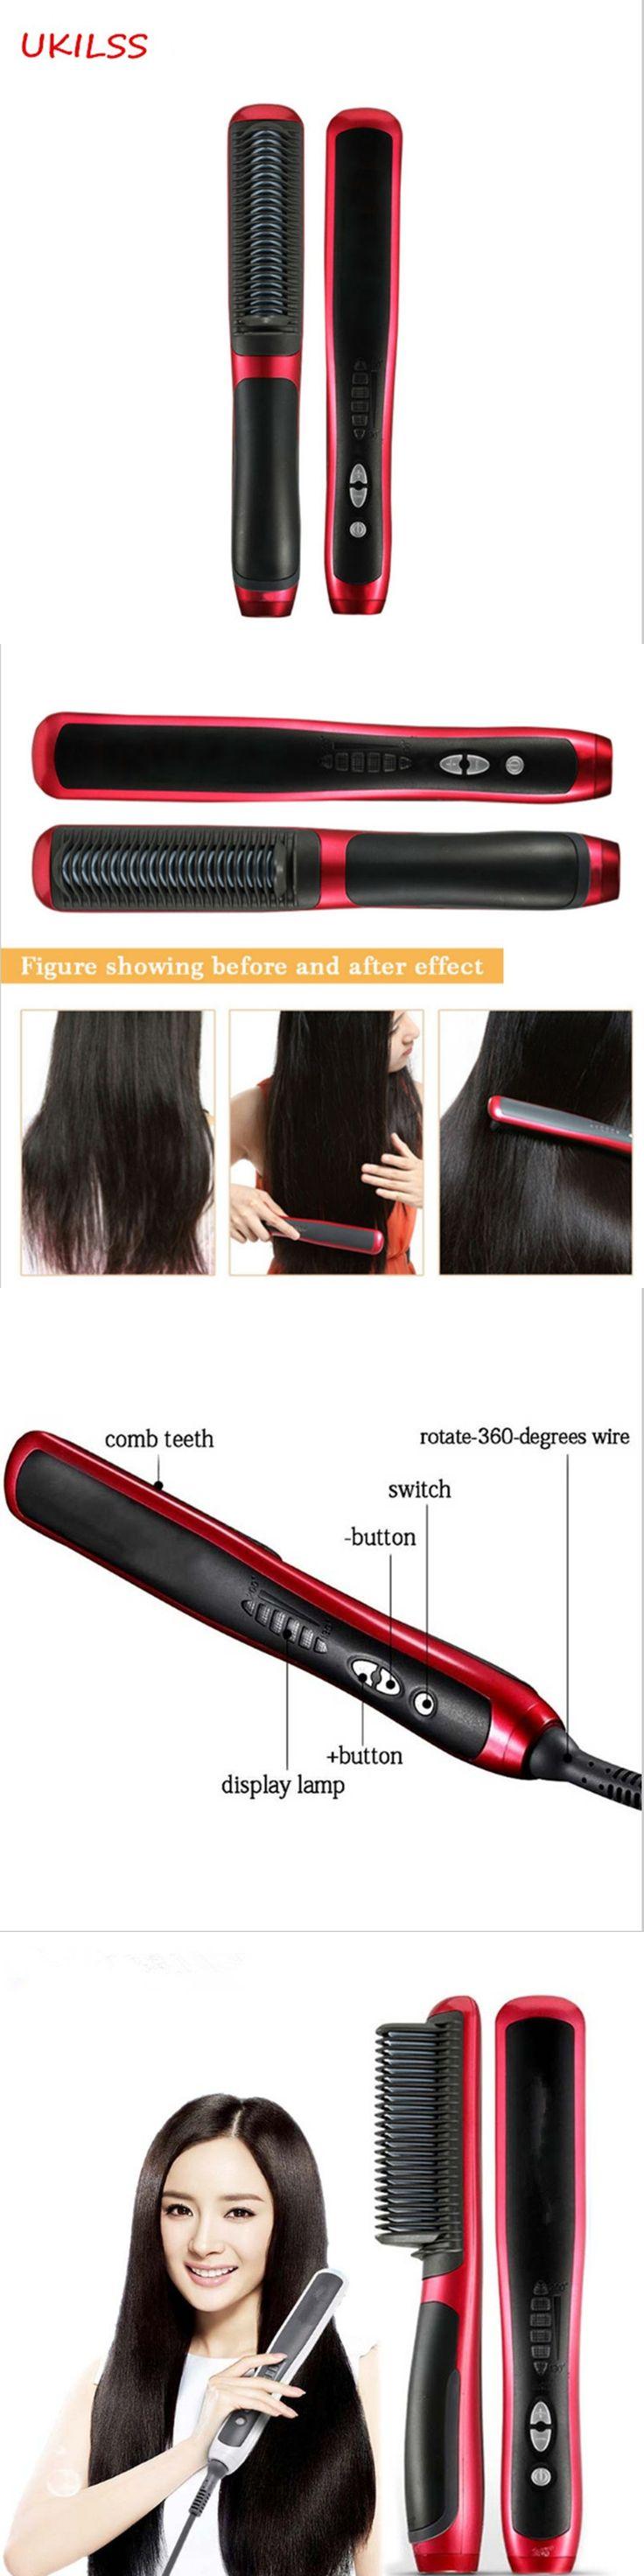 2017 NewView Professional Ceramic Electric Hair Straightener Brush Detangling Hair Straightening Iron Comb Smooth Brush Styling